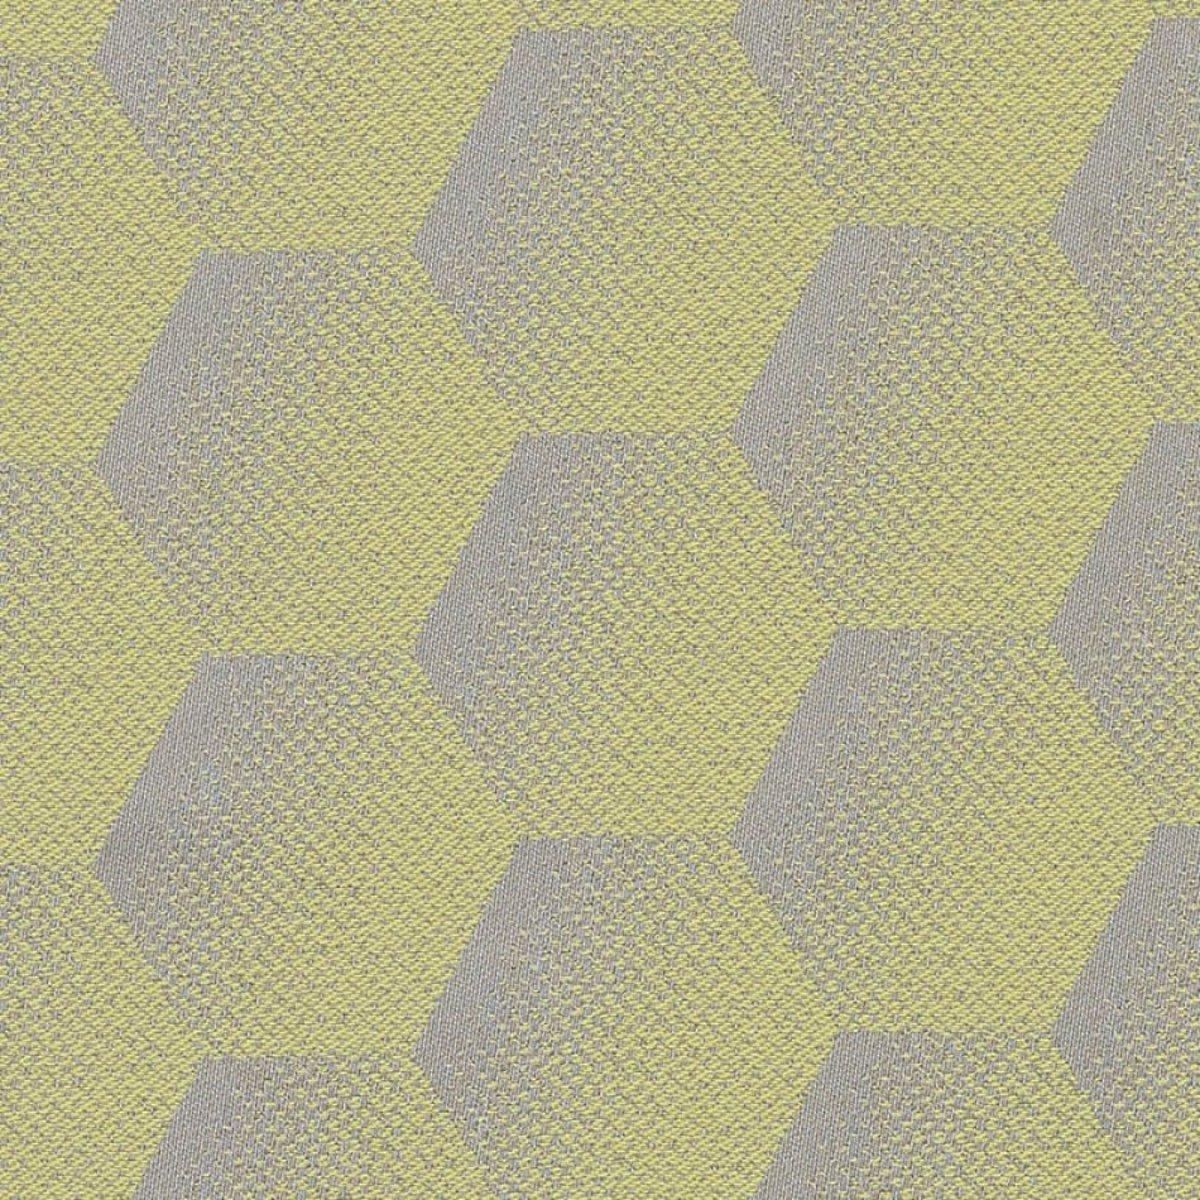 SUNBRELLA hexagon lemon jacquard stof kopen